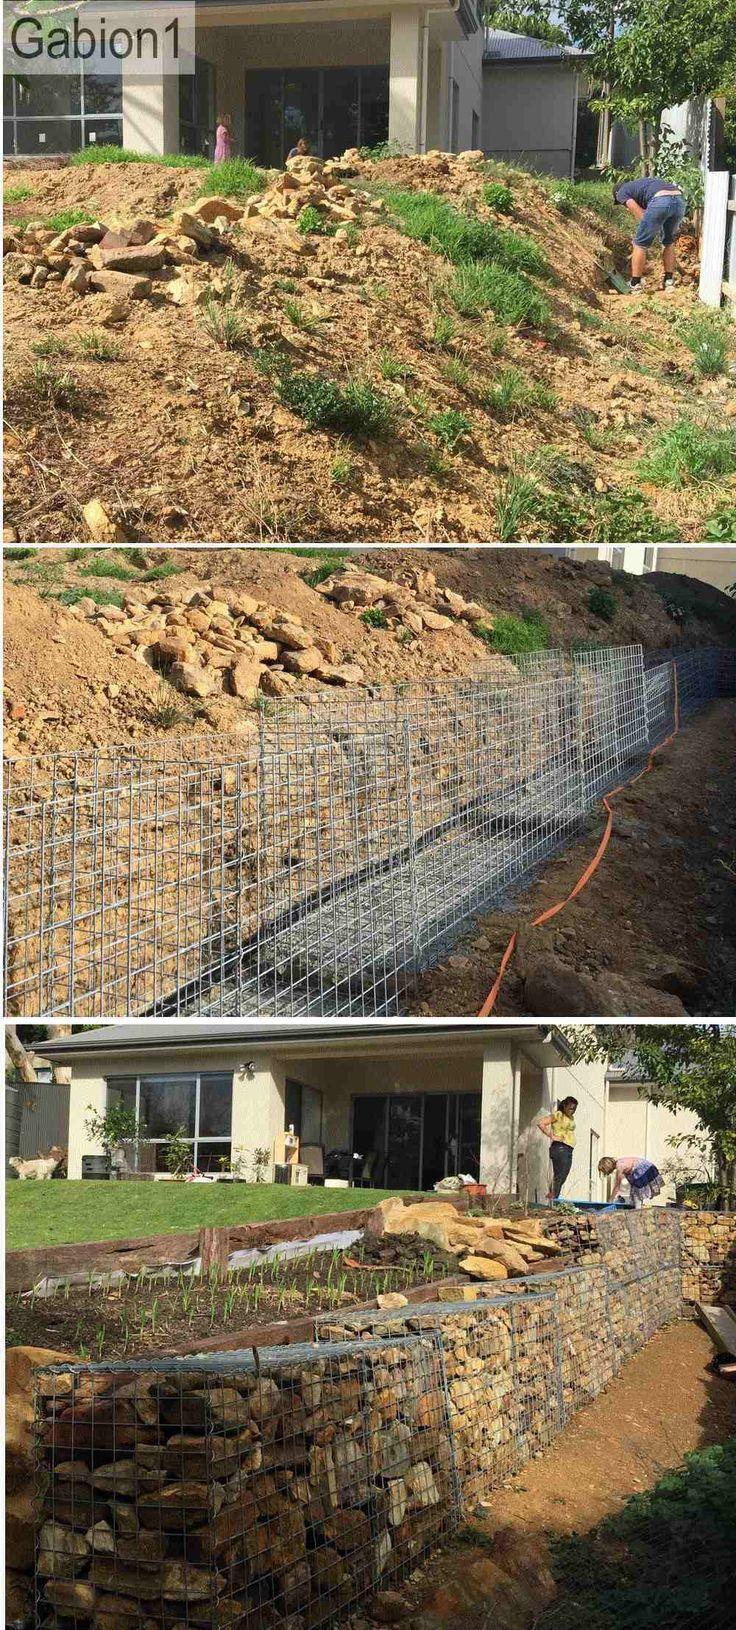 gabion retaining wall construction http://www.gabion1.com